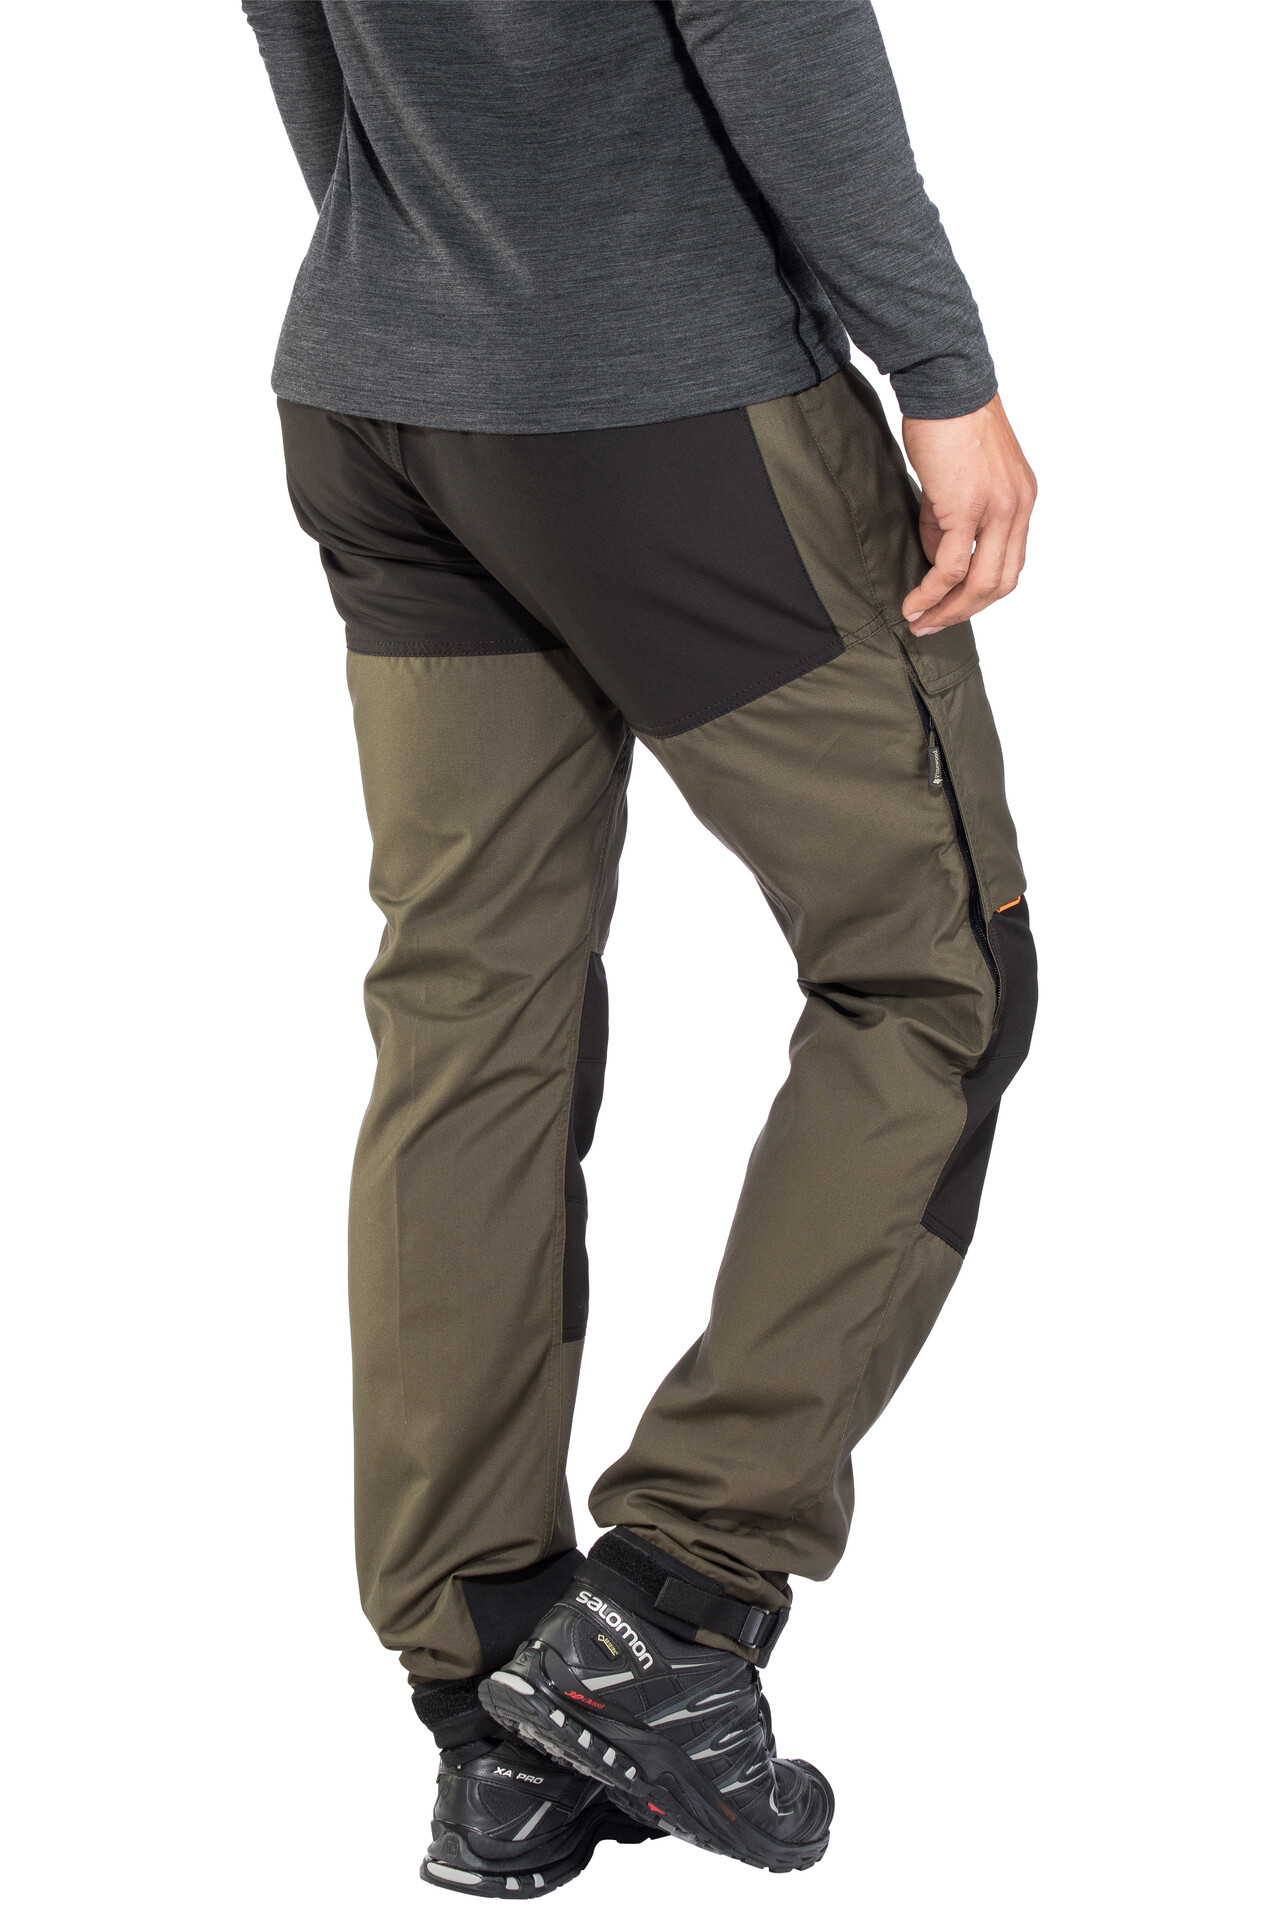 Pinewood Caribou TC Pantalon Homme